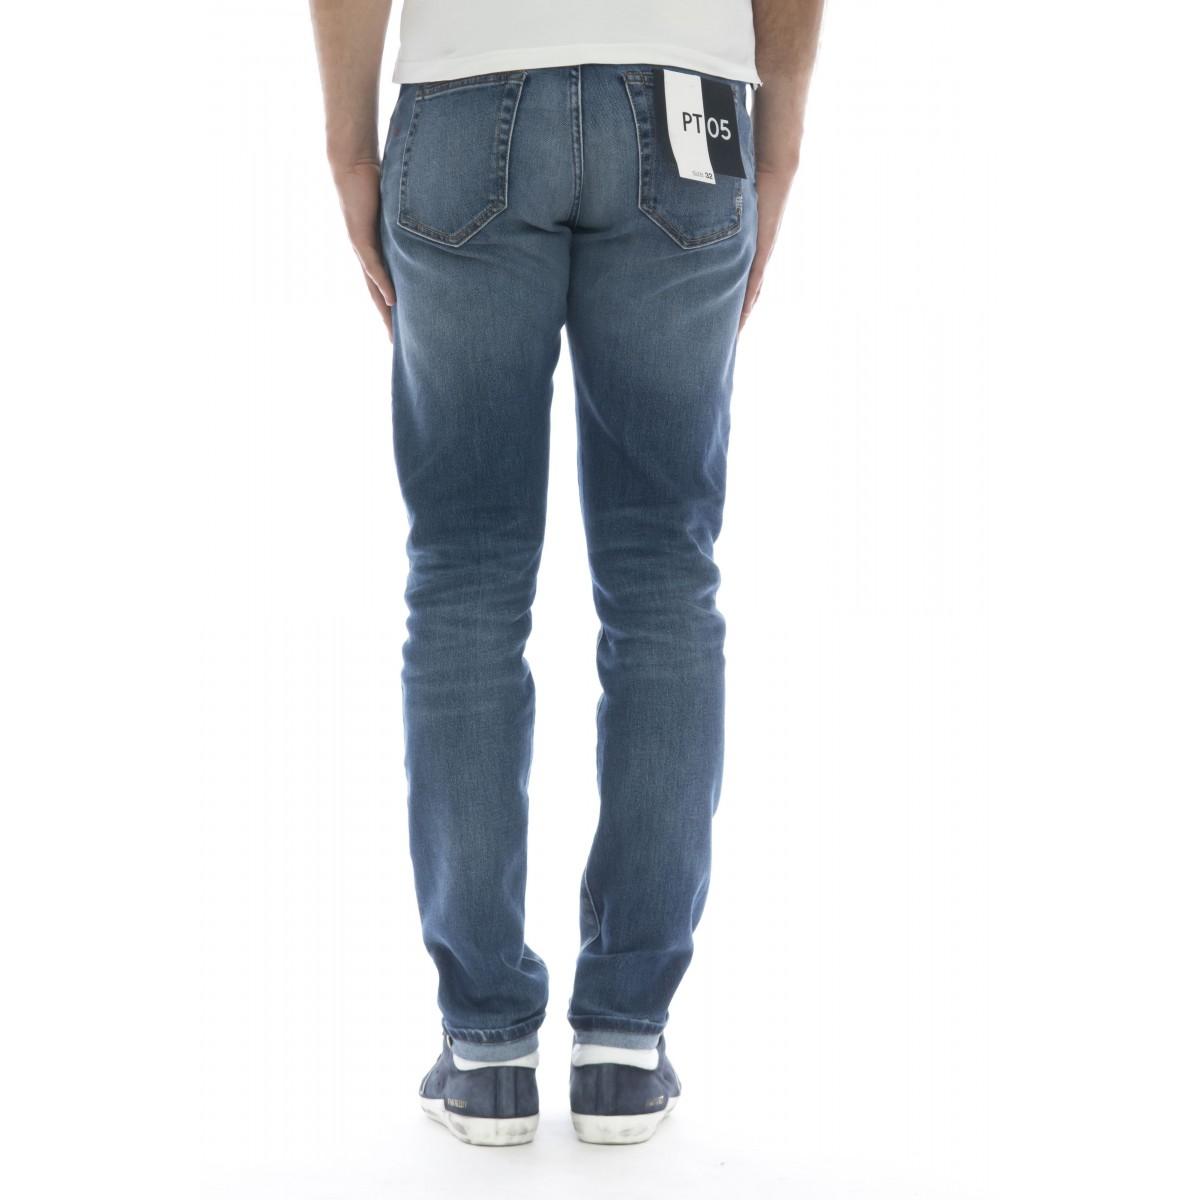 Jeans - Soul tx10 jeans slim